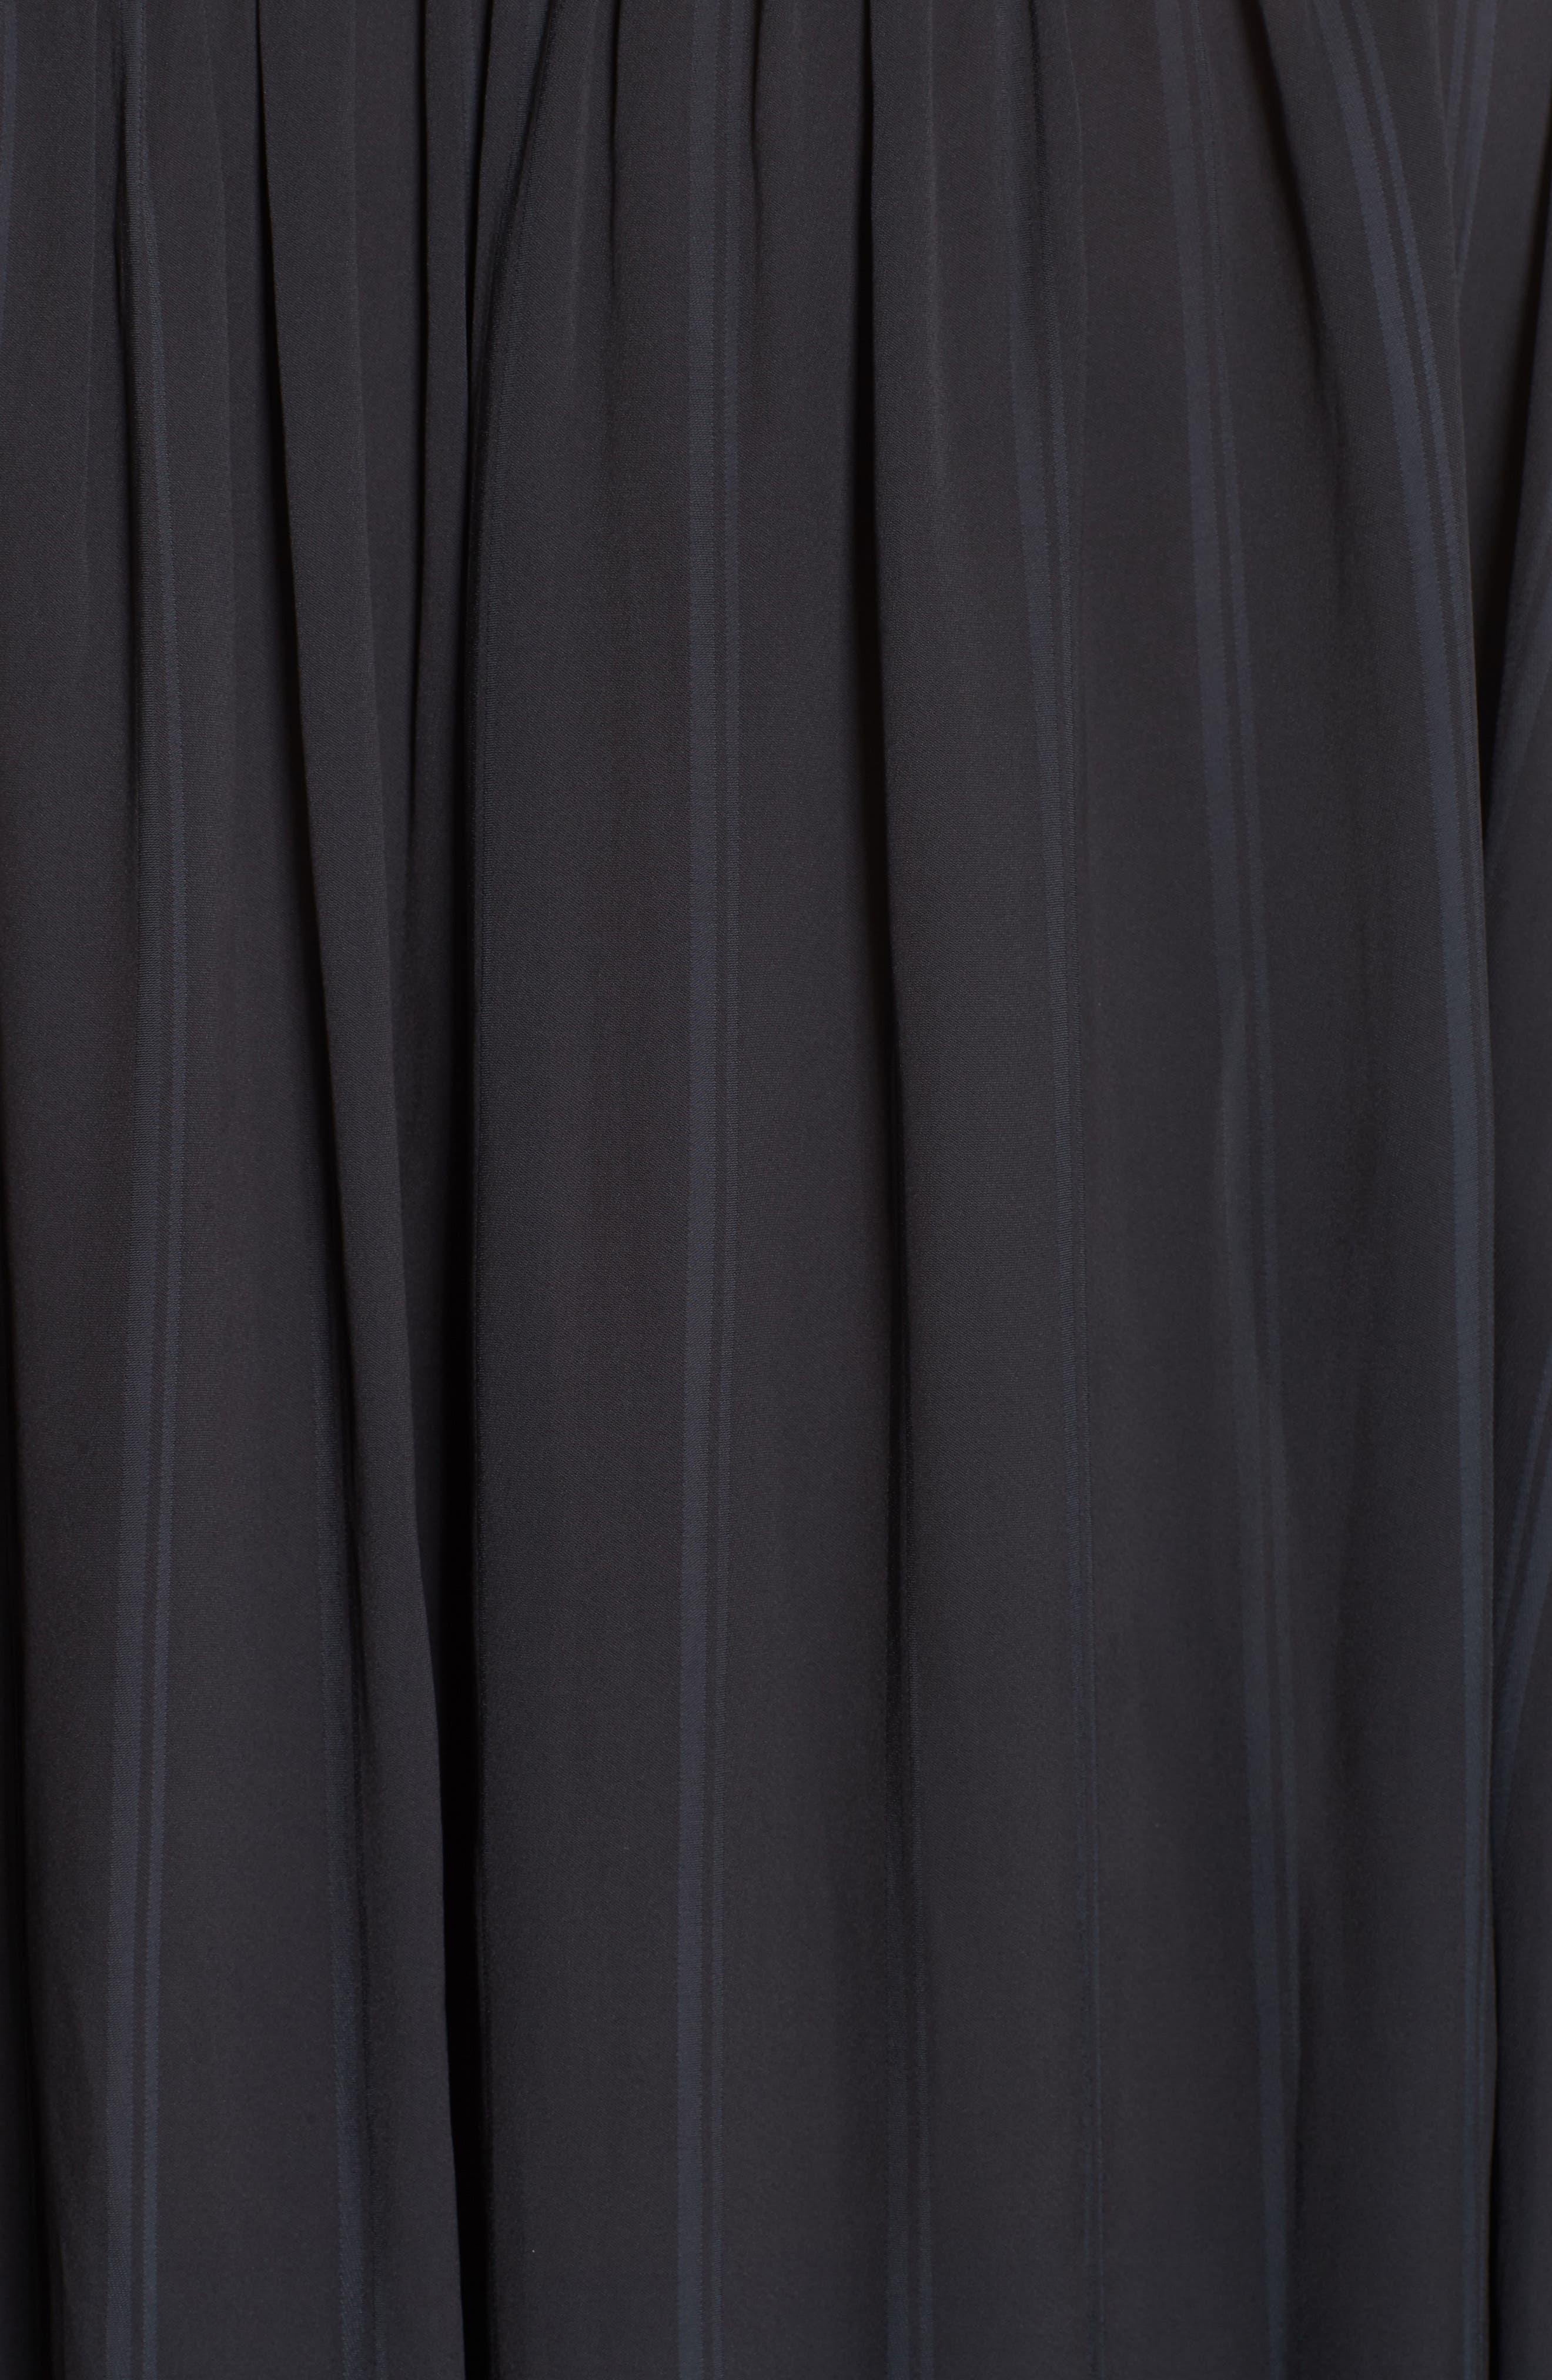 Stripe Balloon Sleeve Blouse,                             Alternate thumbnail 5, color,                             BLACK SHADOW STRIPE